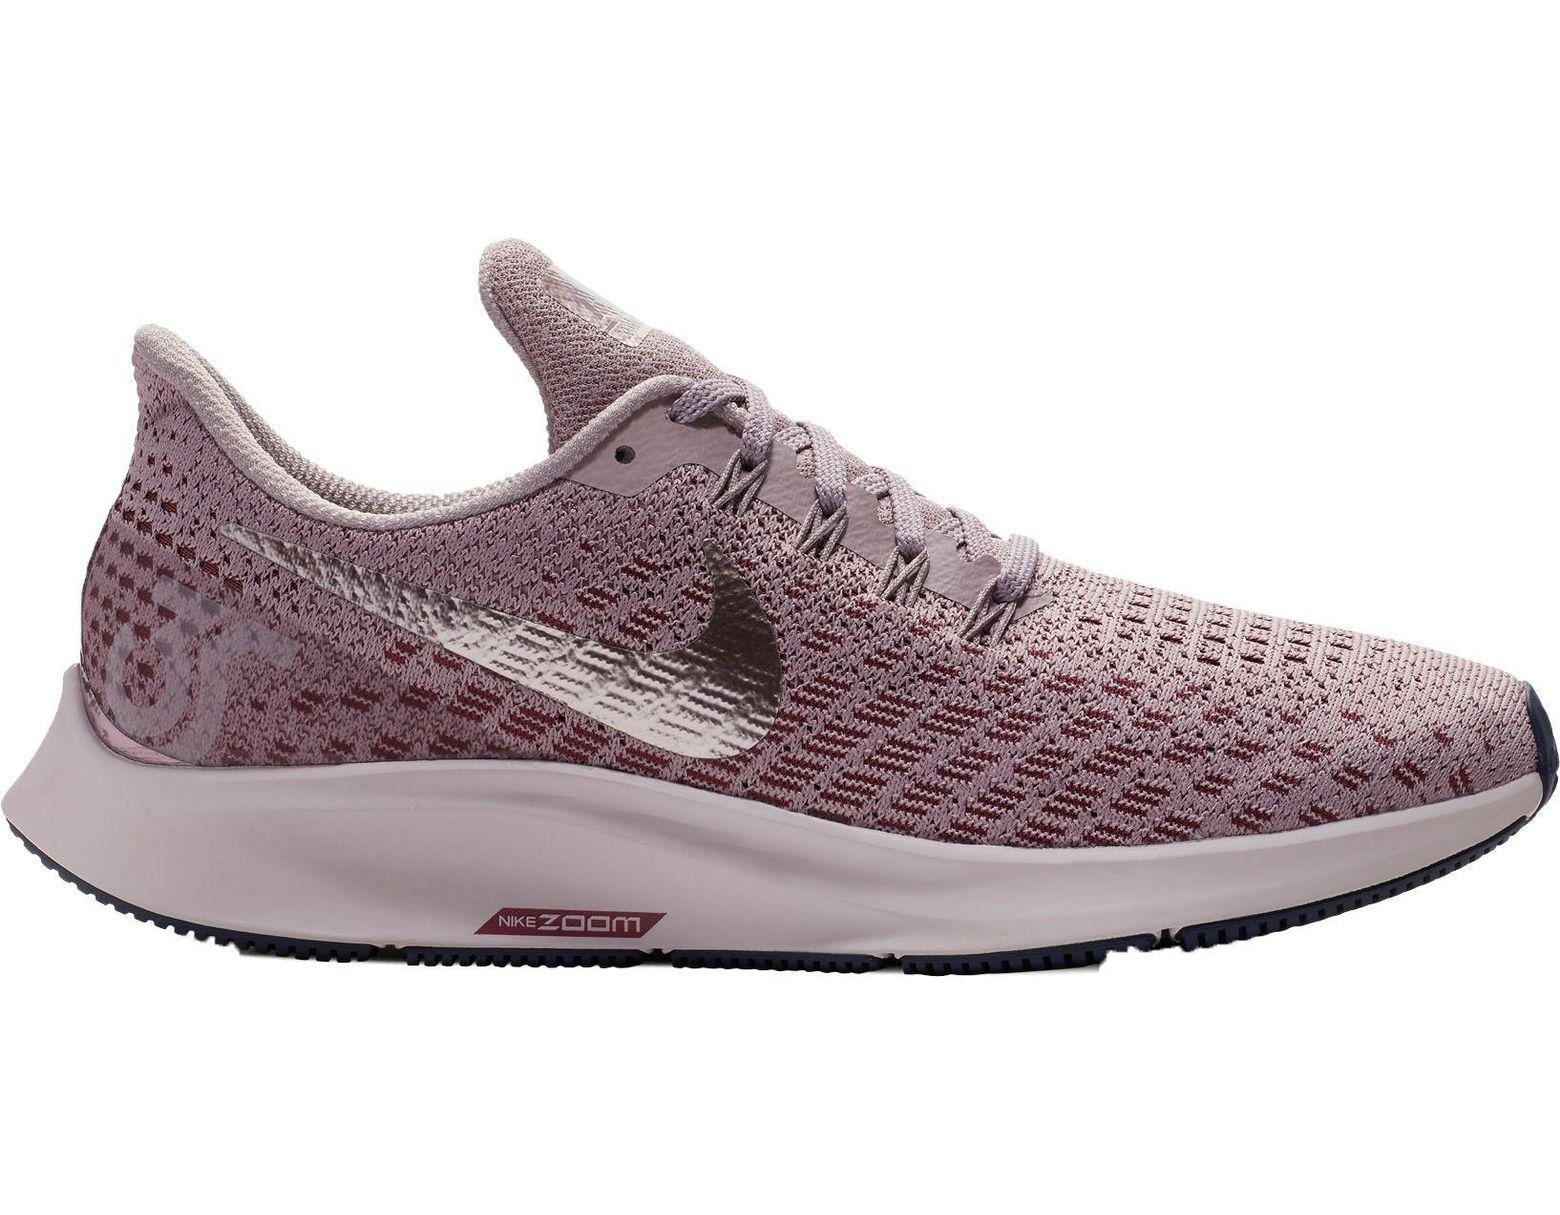 47f055d81cc15 Lyst - Nike Air Zoom Pegasus 35 Running Shoes